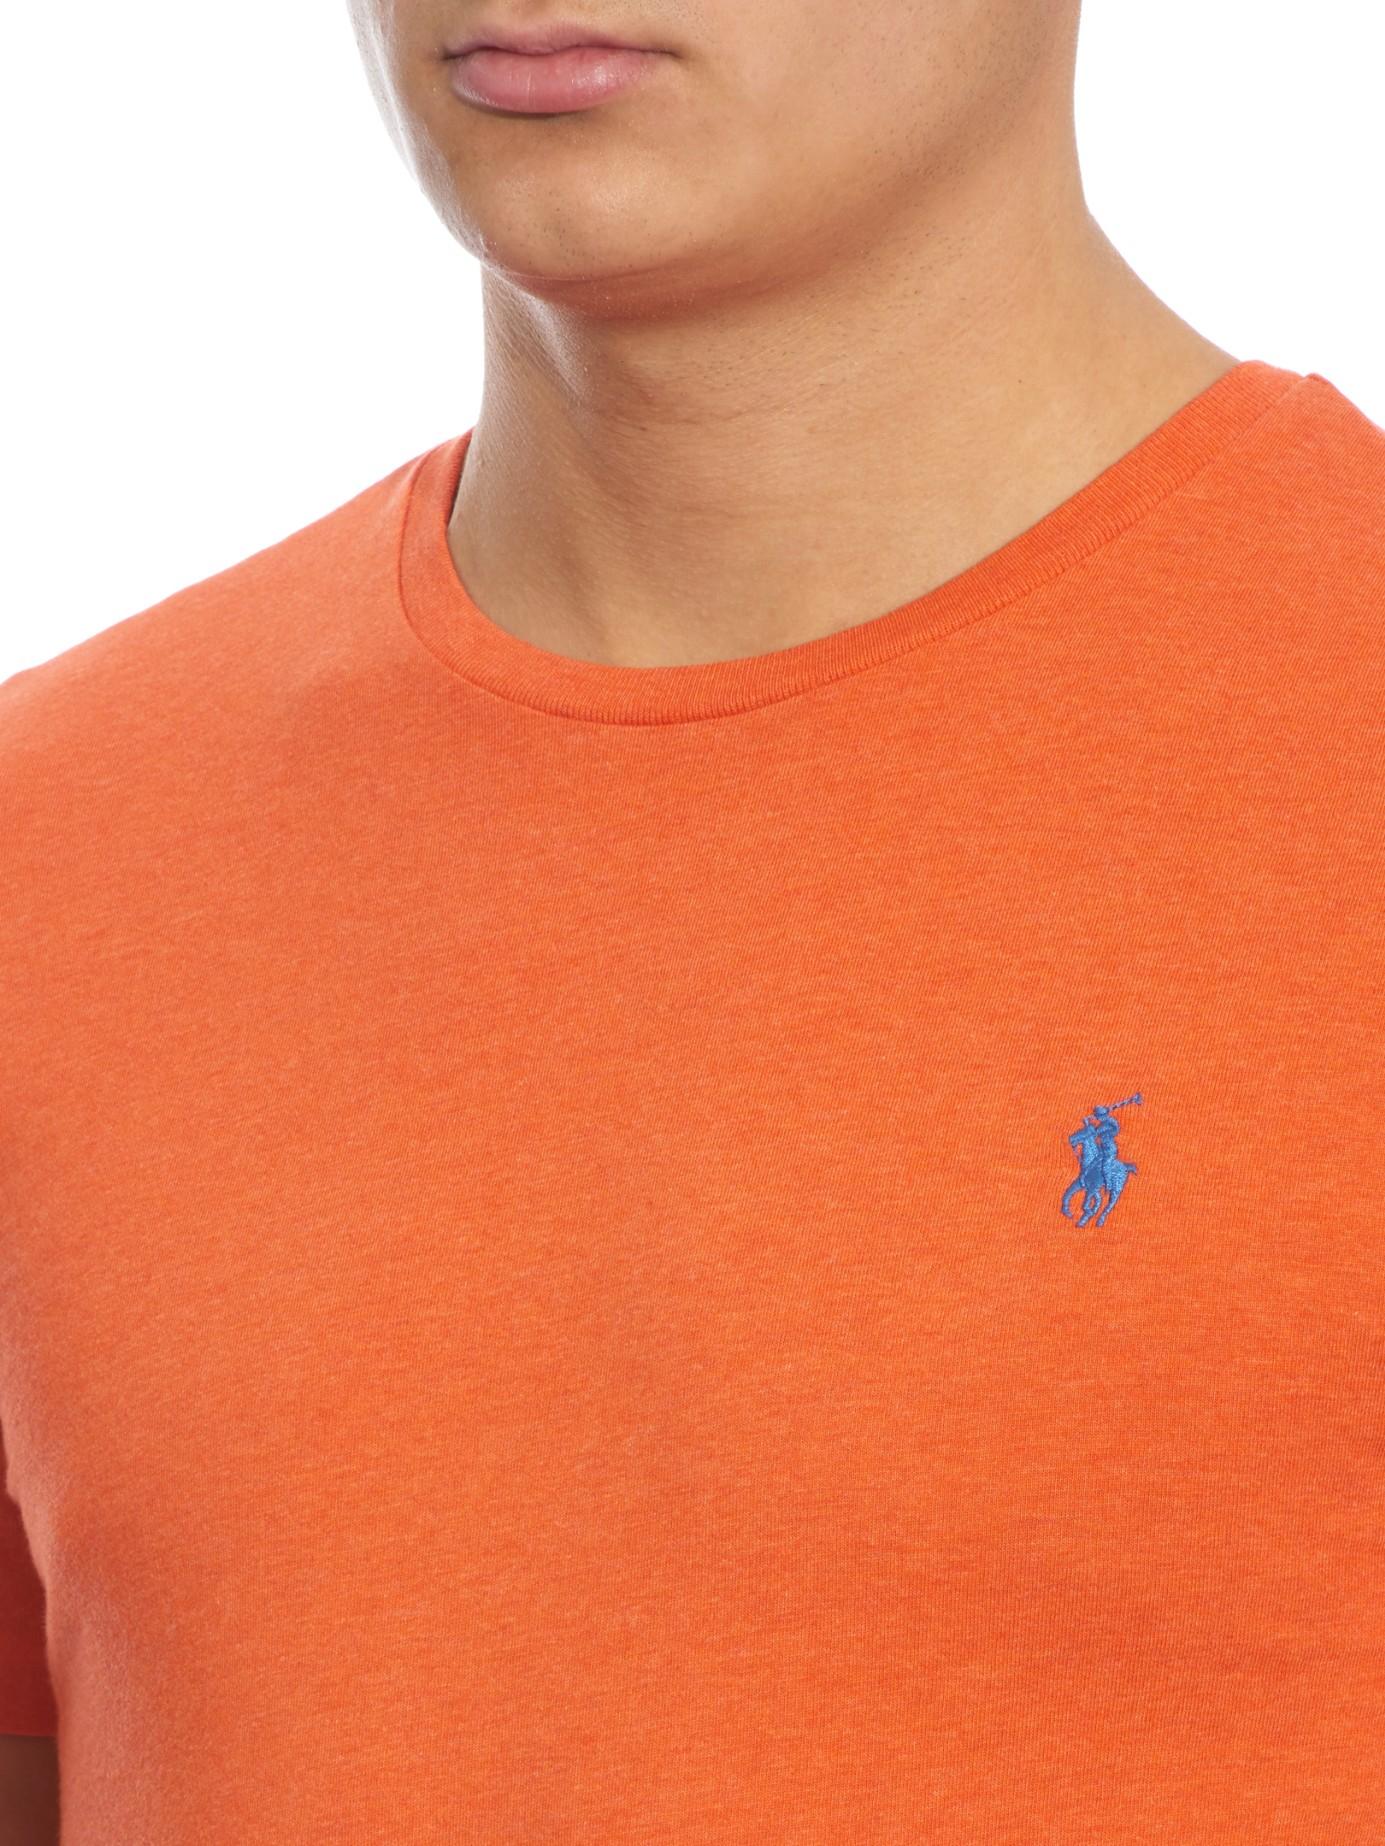 075d68a2c0e Polo Ralph Lauren Crew-neck T-shirt in Orange for Men - Lyst